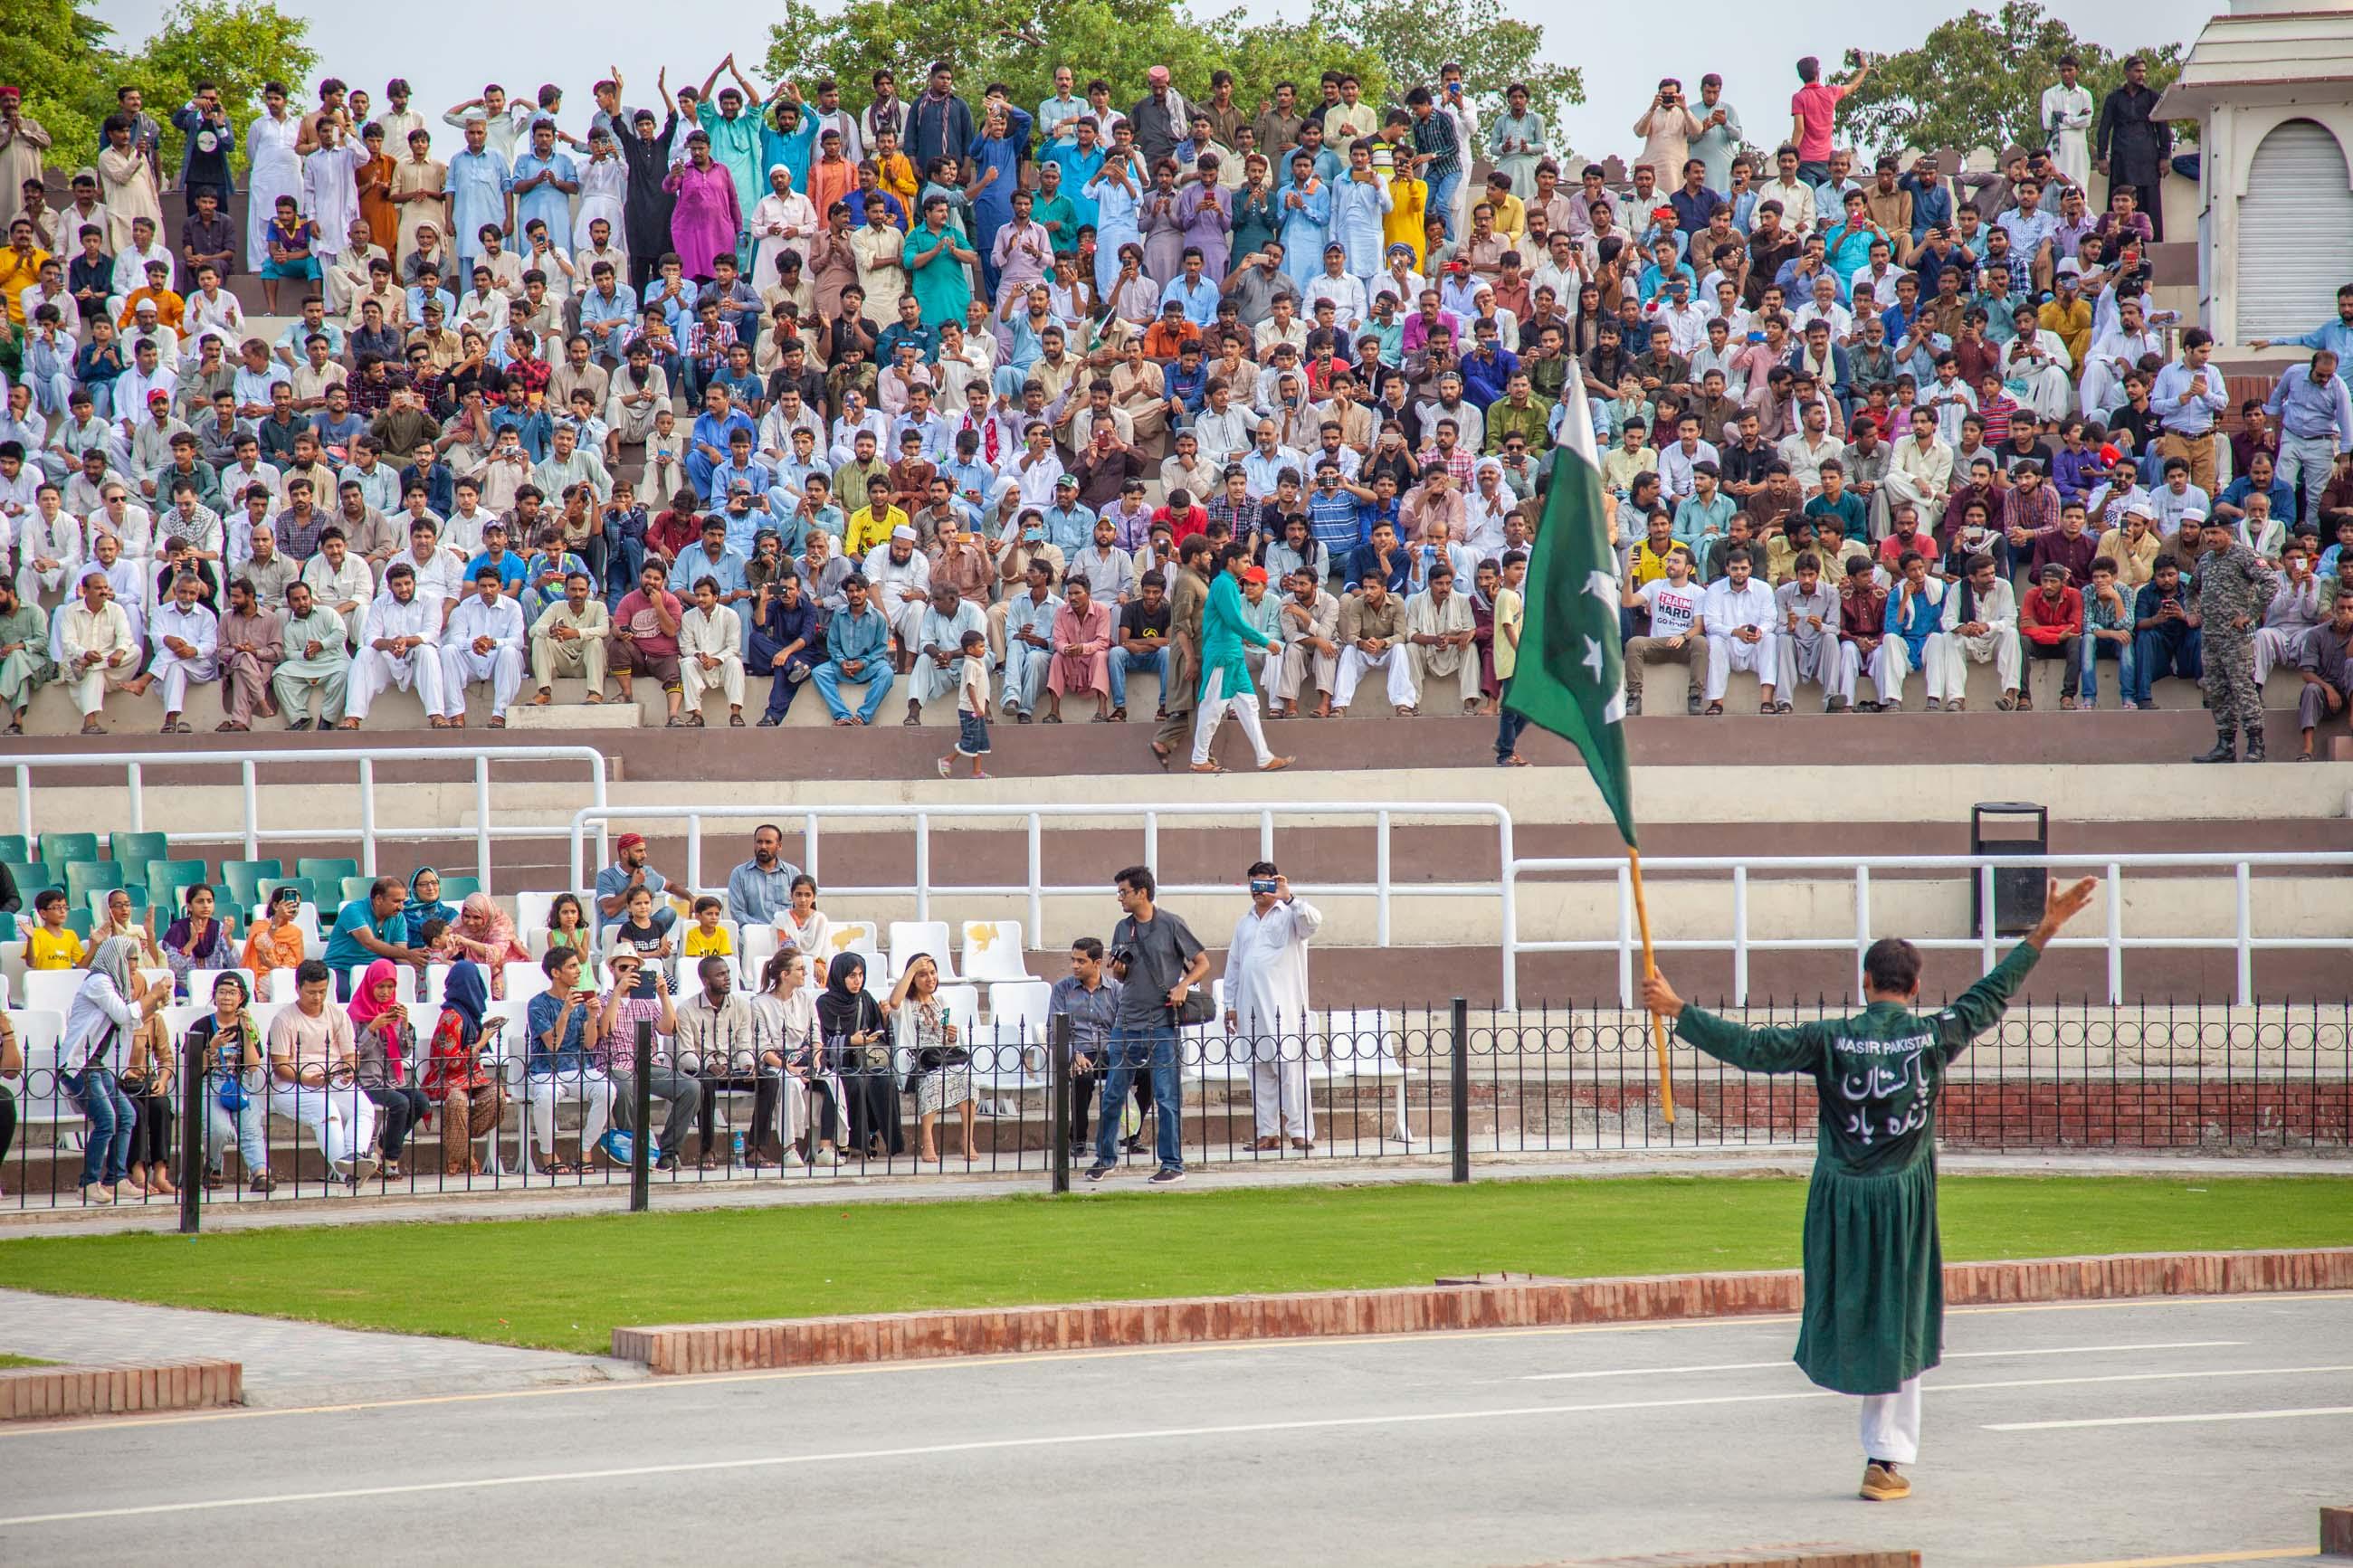 https://bubo.sk/uploads/galleries/4920/samuelklc_pakistan_peshawar_lahore_img_0186.jpg